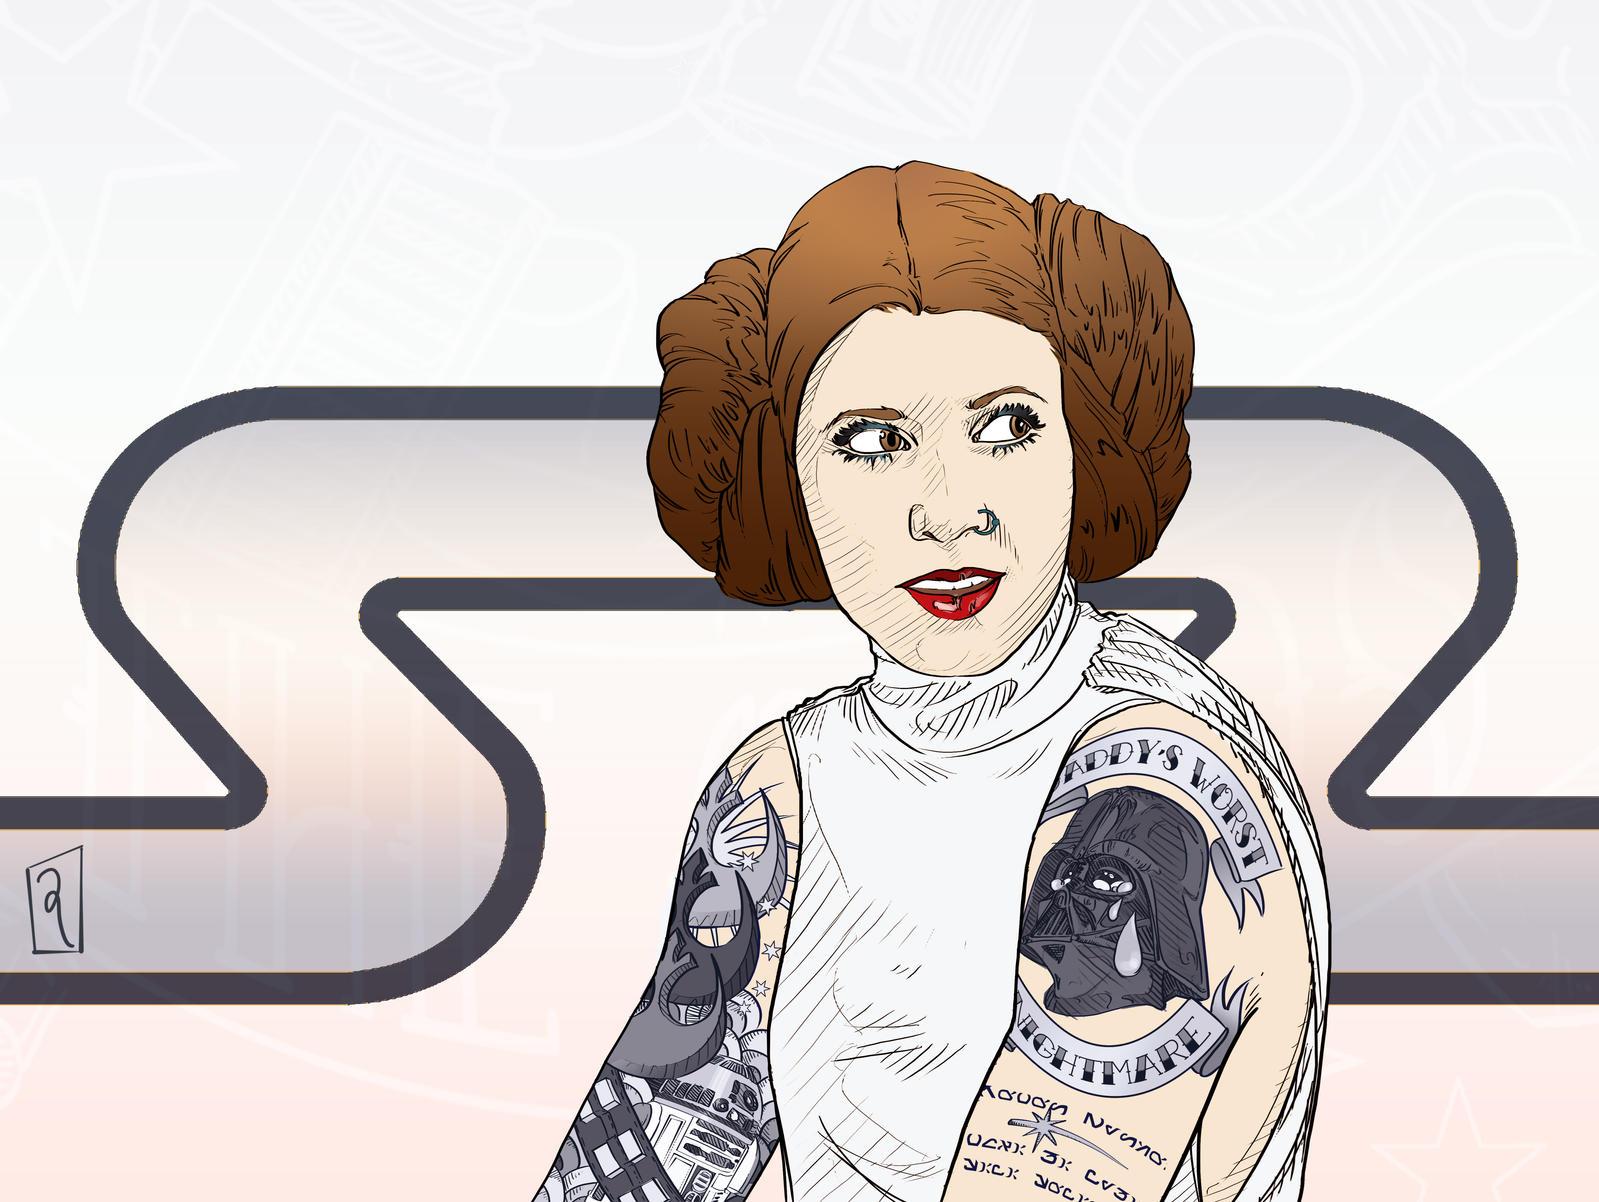 Rebels Princess Leia By Gwynconawayart On Deviantart